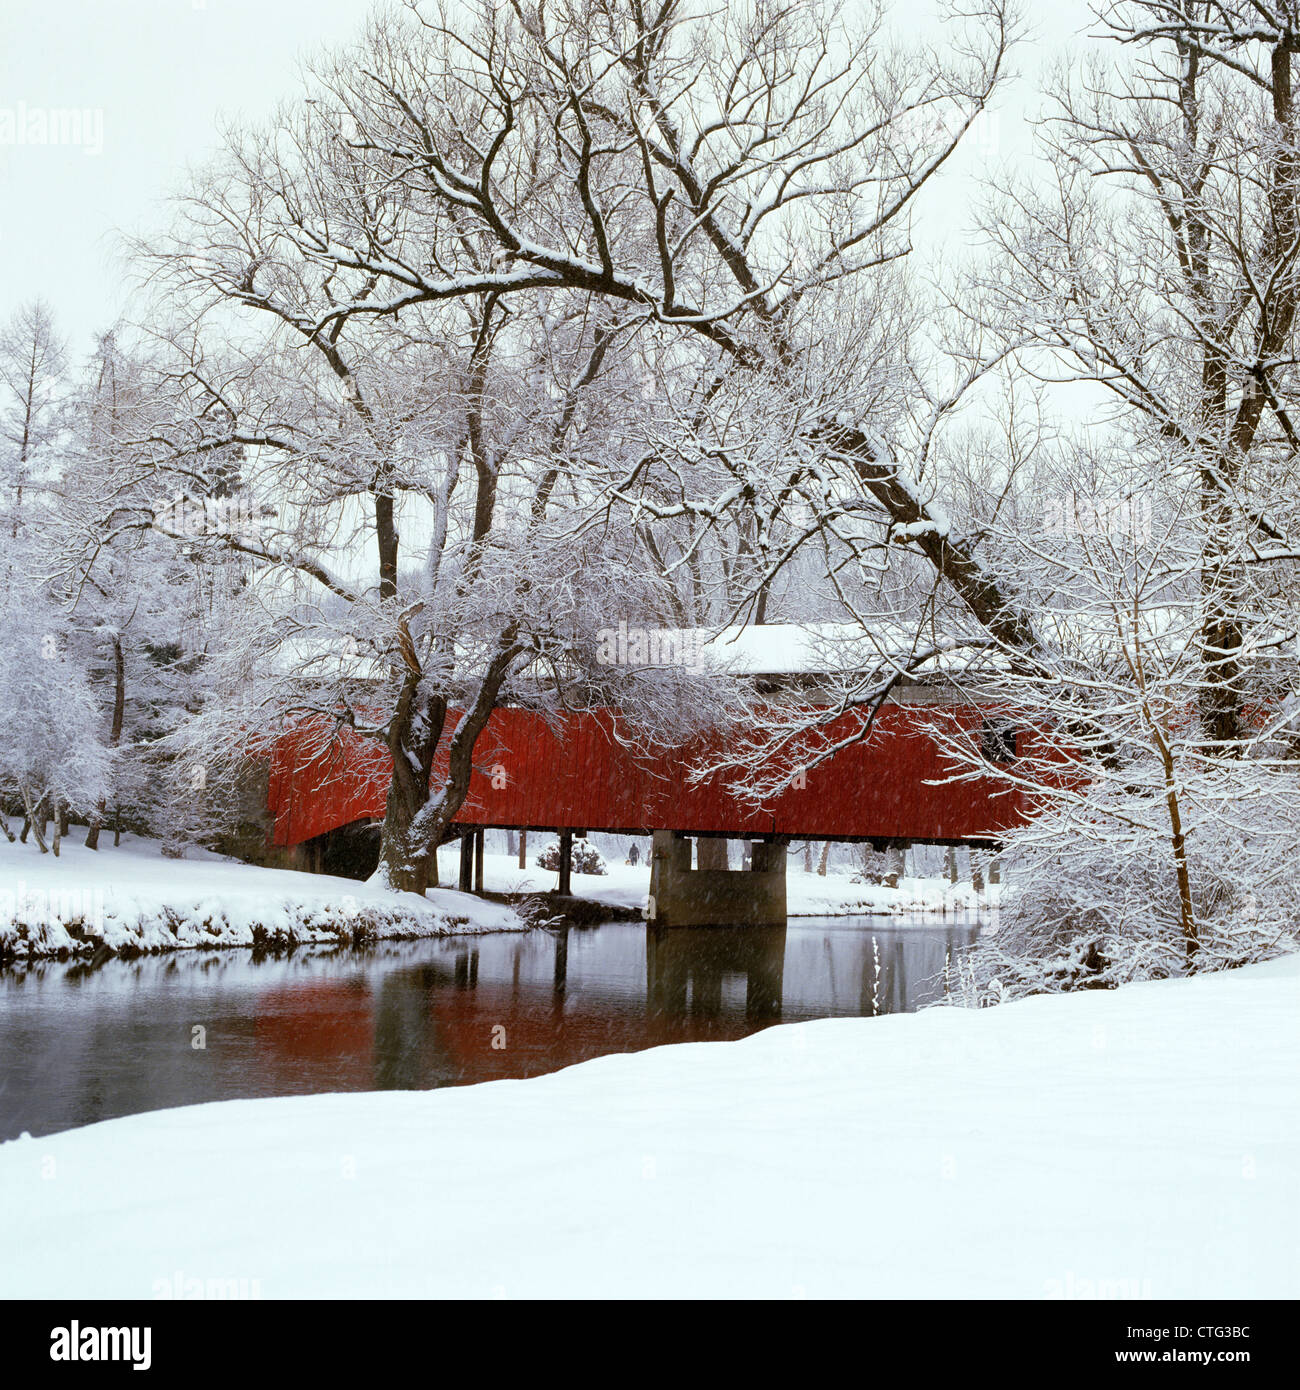 BOGART'S BRIDGE RED COVERED BRIDGE WITH SNOWY LANDSCAPE LEHIGH VALLEY  PENNSYLVANIA - BOGART'S BRIDGE RED COVERED BRIDGE WITH SNOWY LANDSCAPE LEHIGH